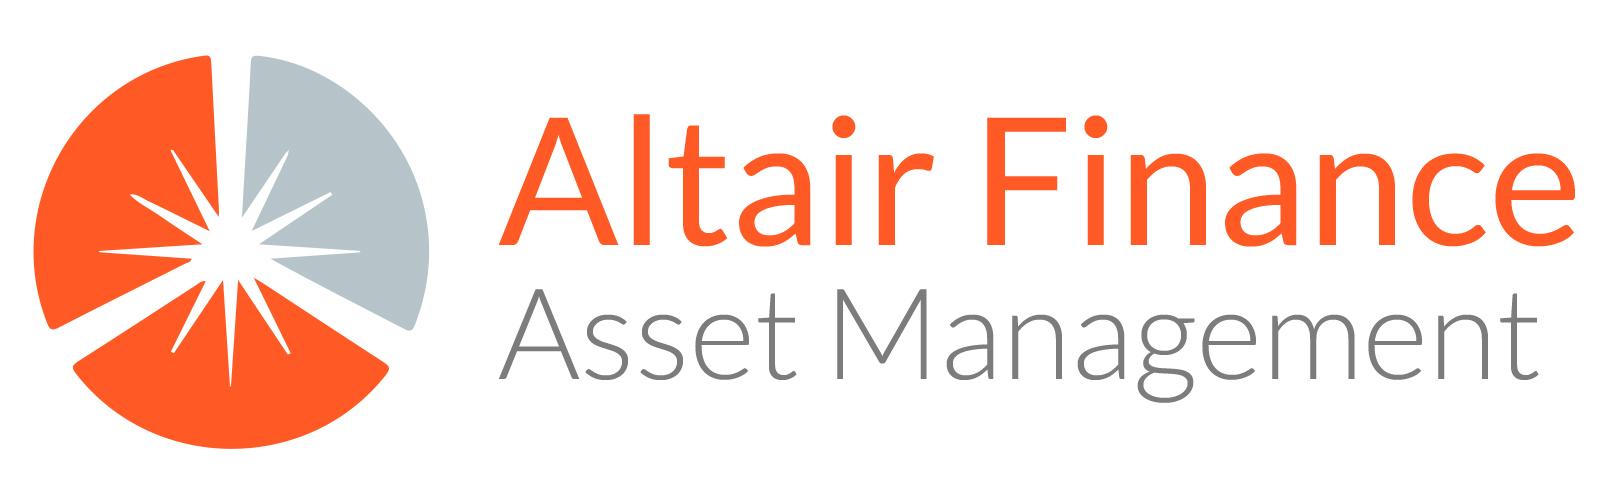 Altair Finance AM